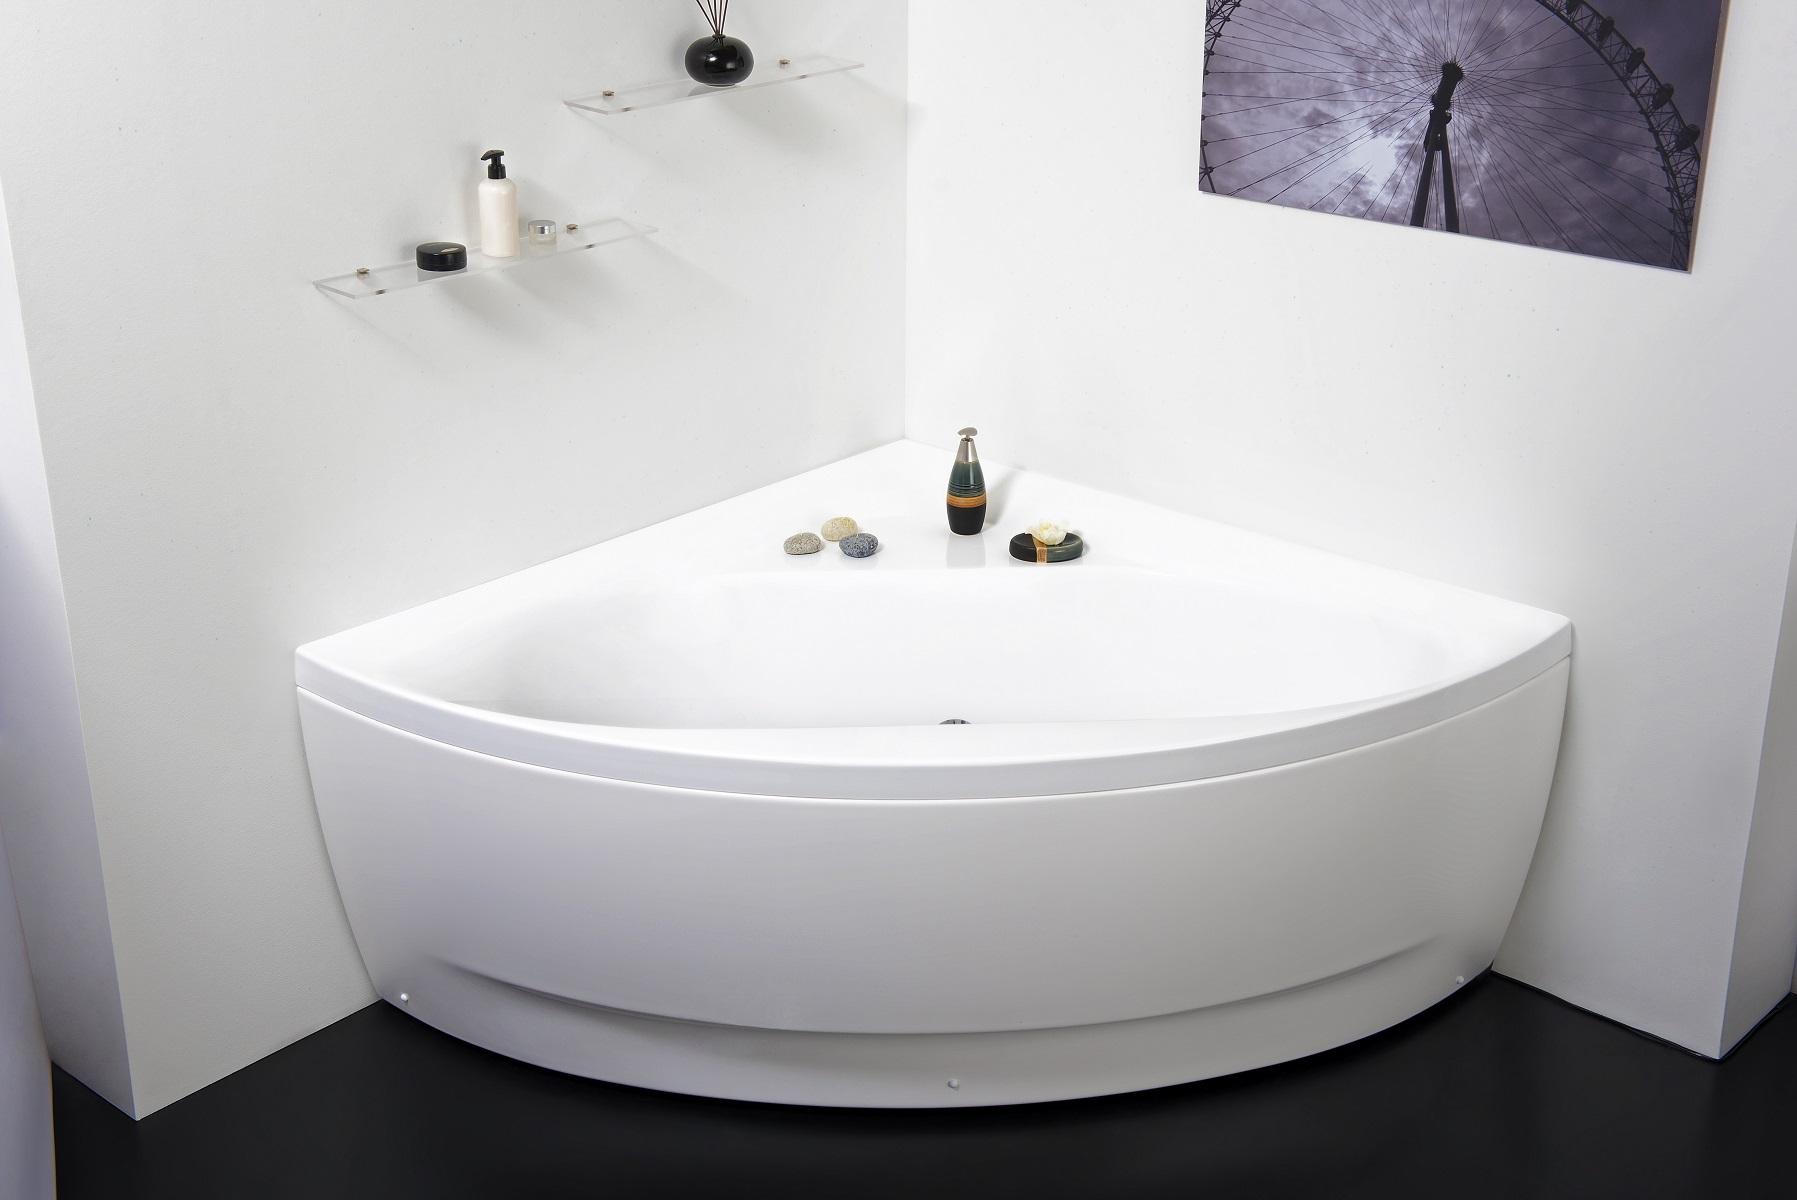 Vasche Da Bagno Angolari Offerte : Vasca da bagno da appoggio